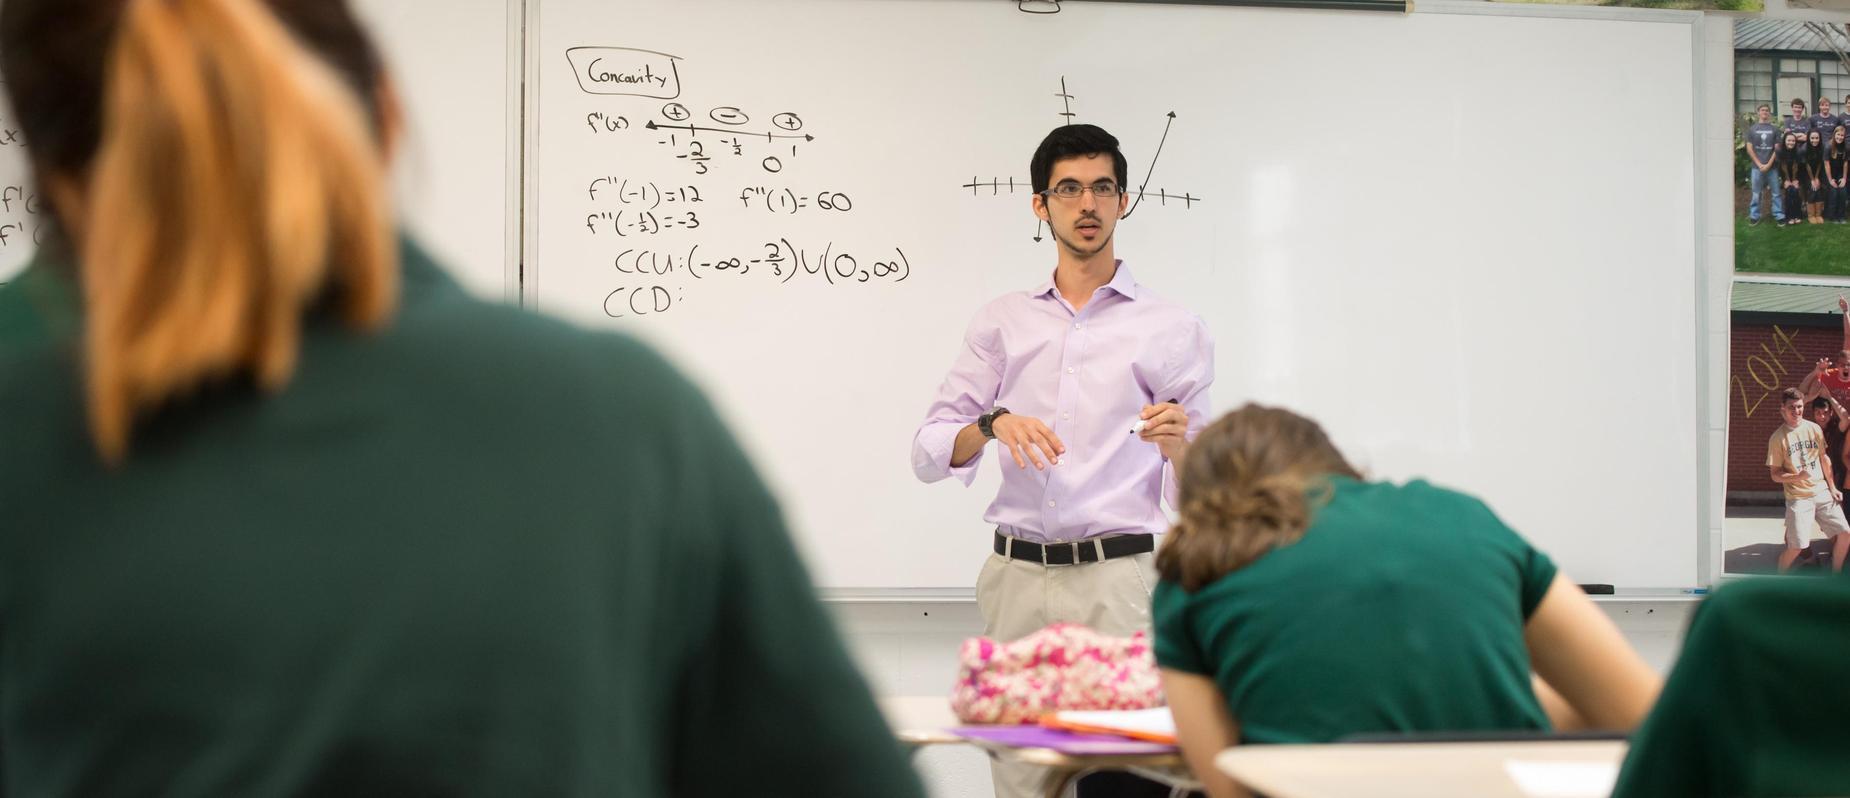 Mr. Fernandez